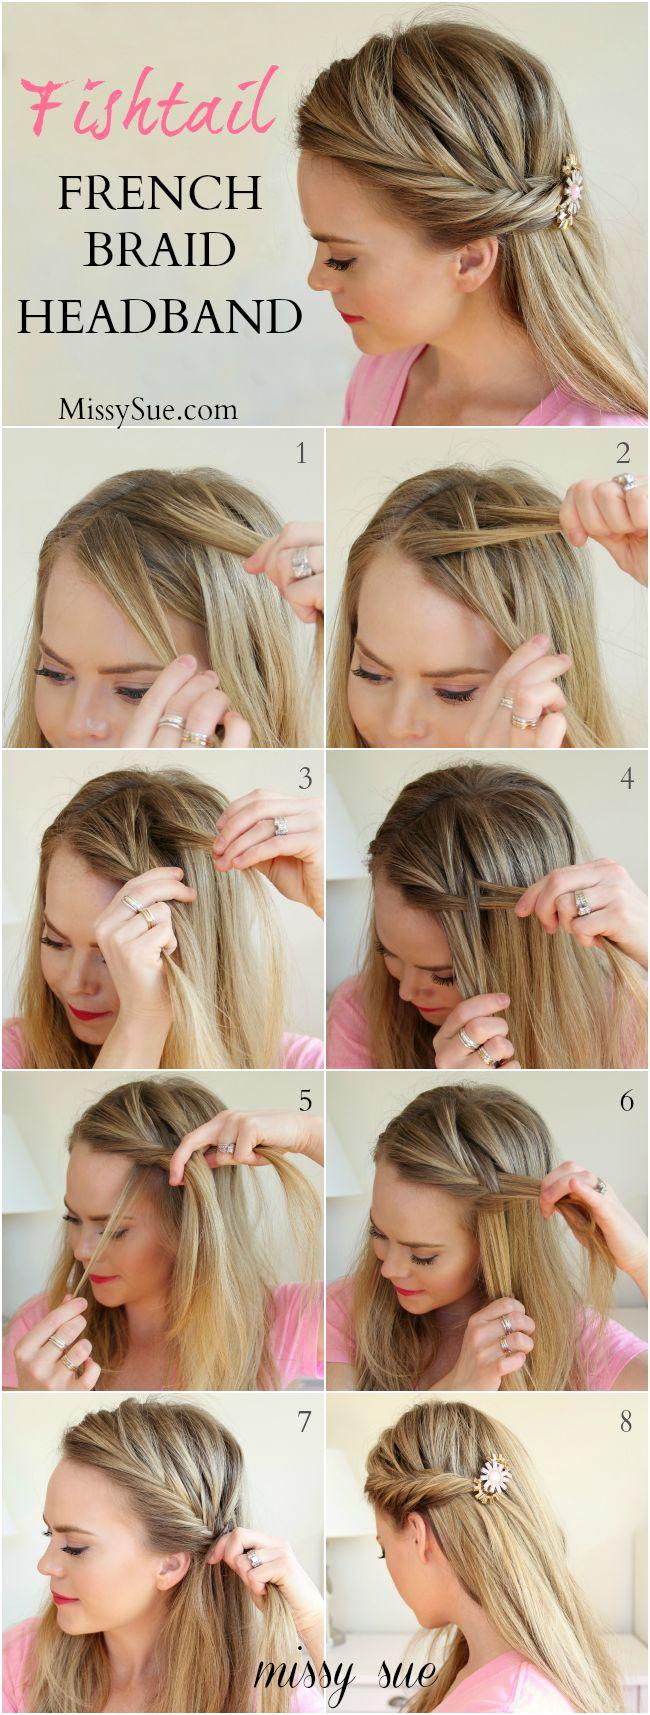 Fishtail French Braid Headband Missy Sue Blog